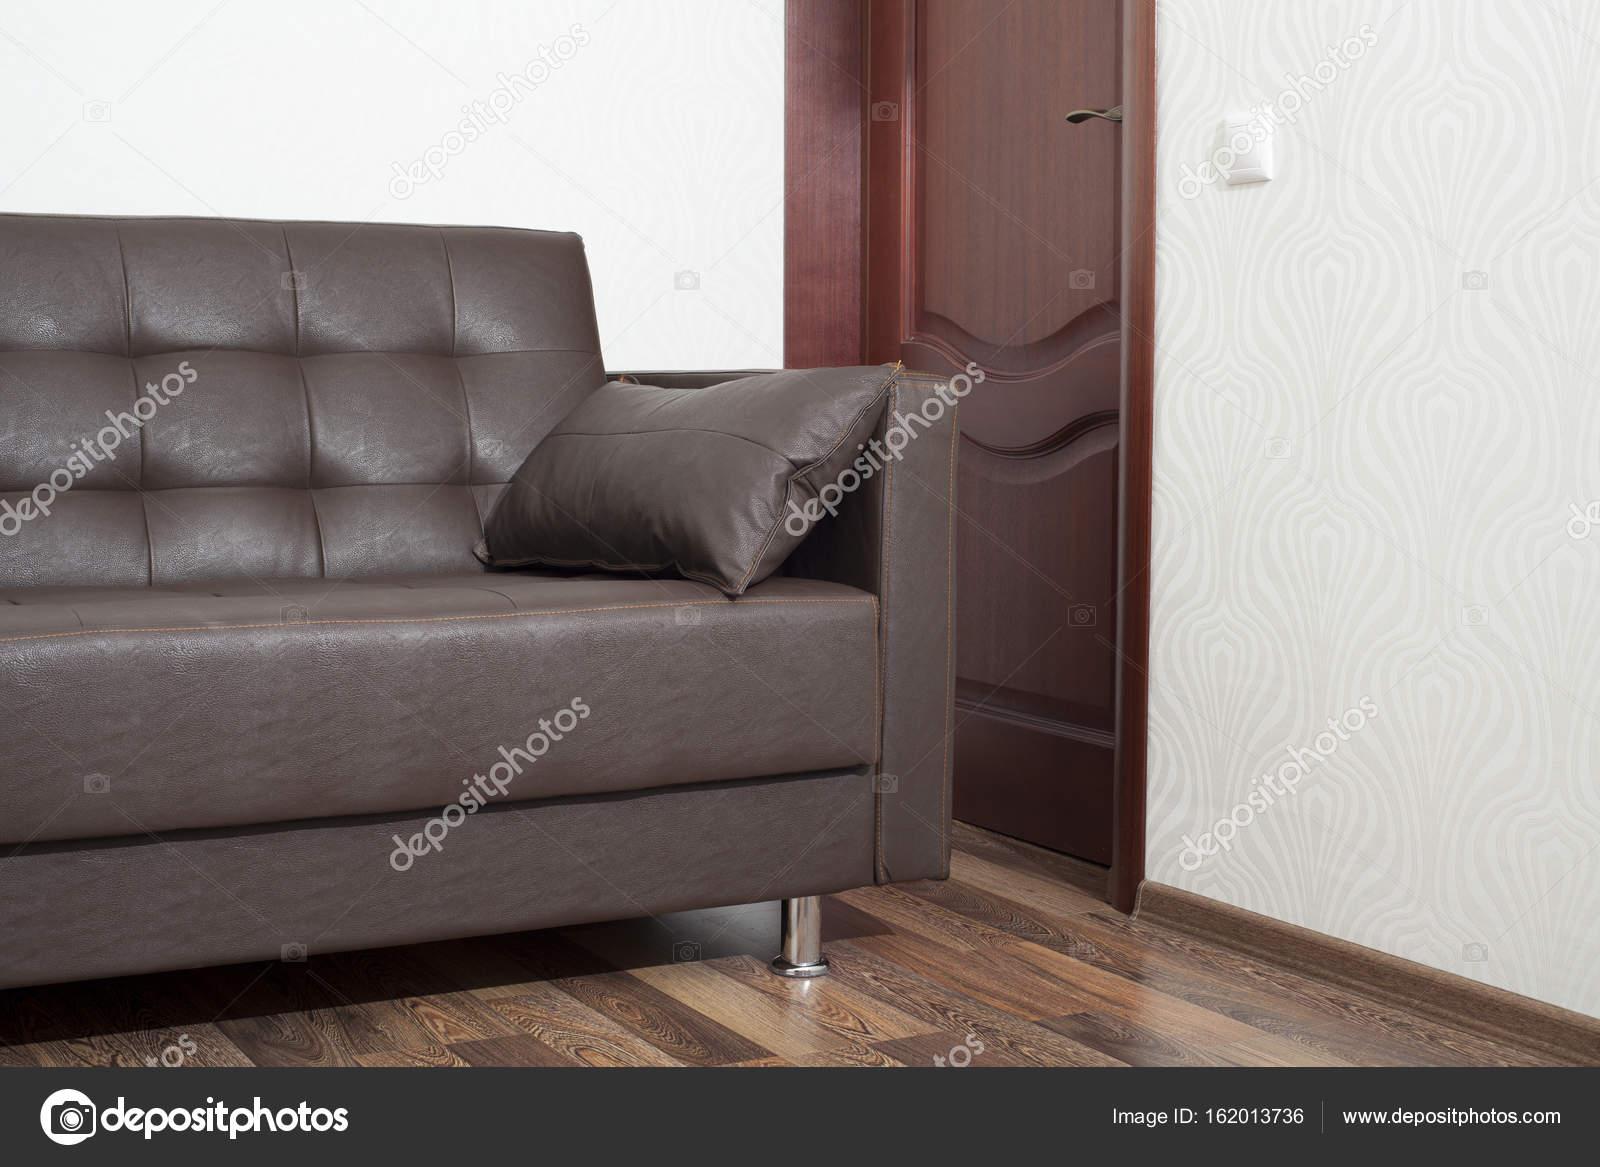 Braune Ledercouch Im Zimmer Stockfoto Yurchello108